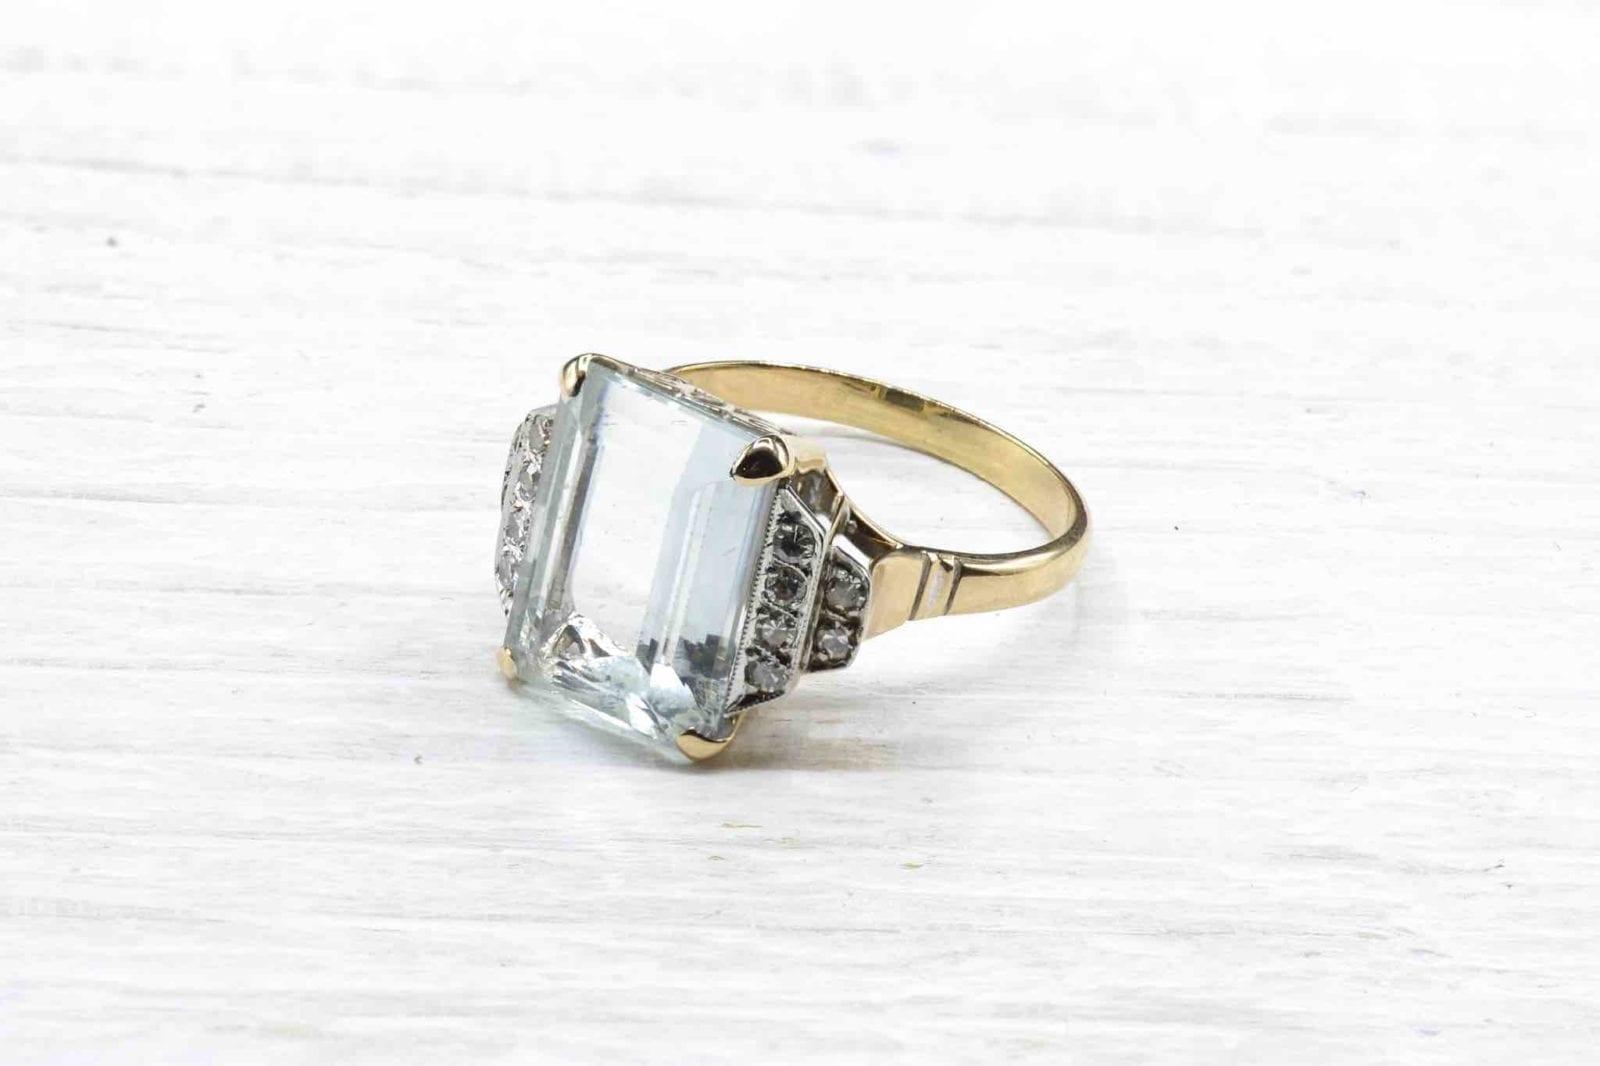 bague aigue-marine diamants